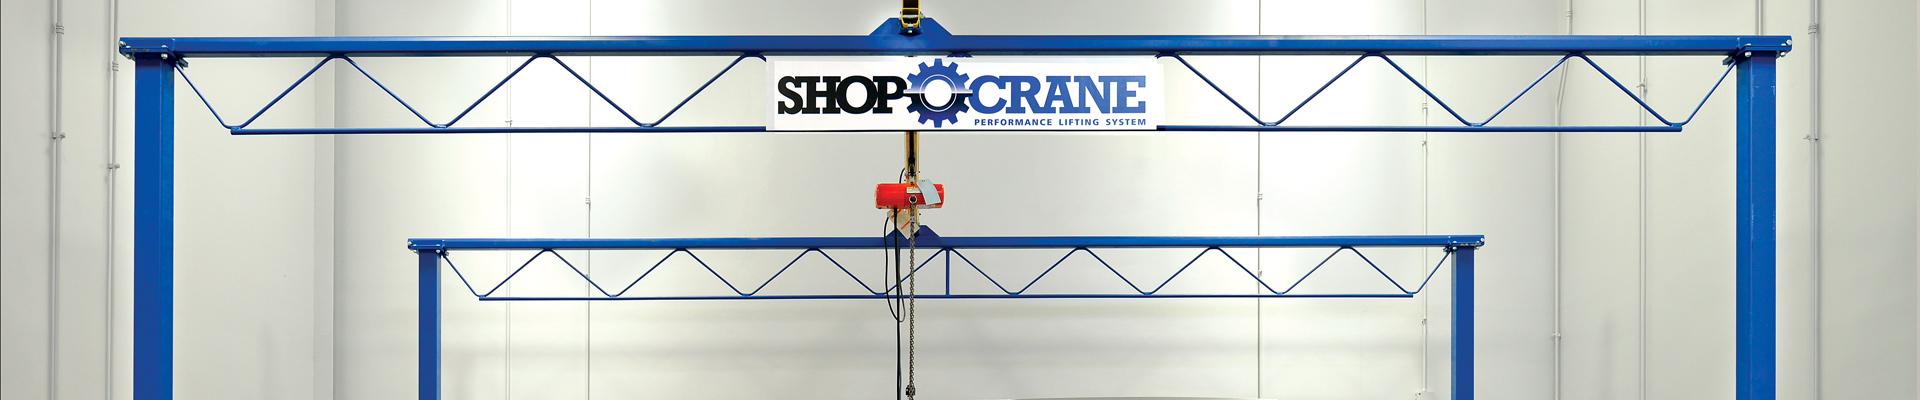 ShopCrane